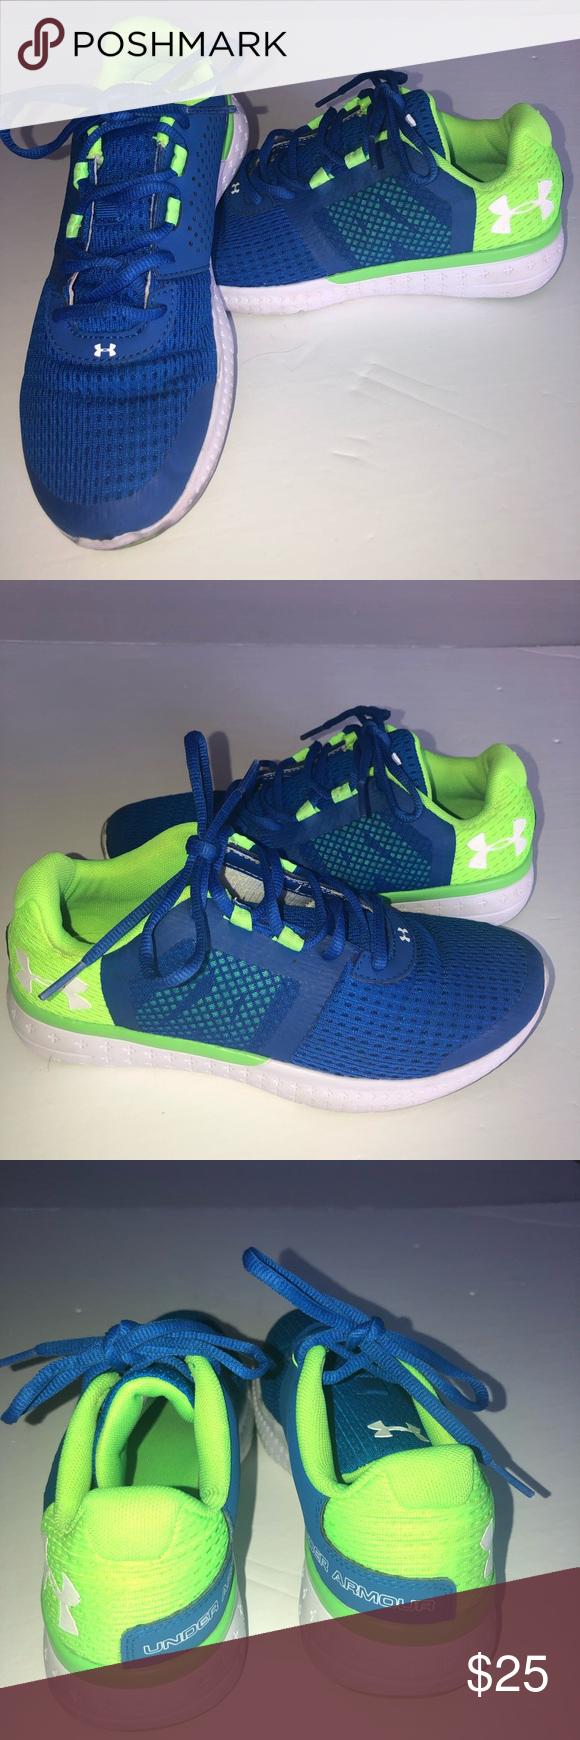 Boys tennis shoes, Under armour tennis